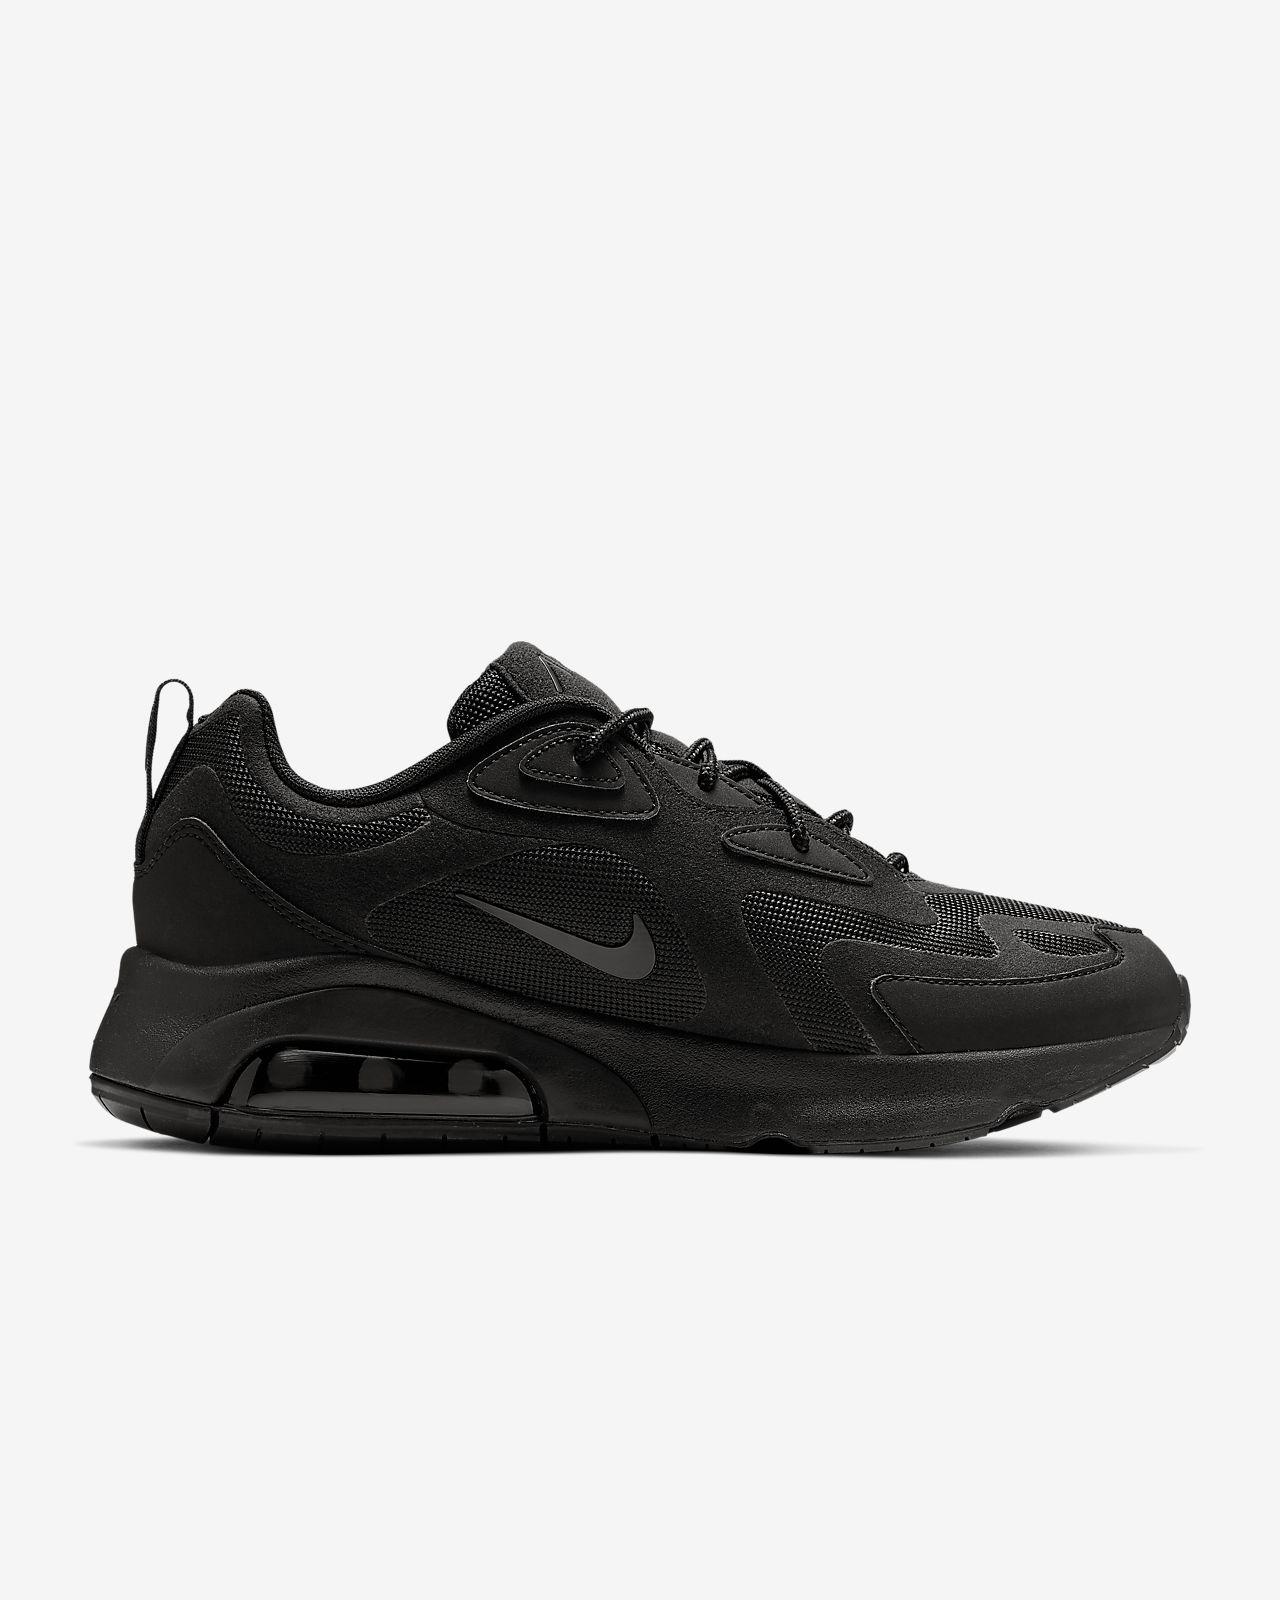 all black nike air max running shoes